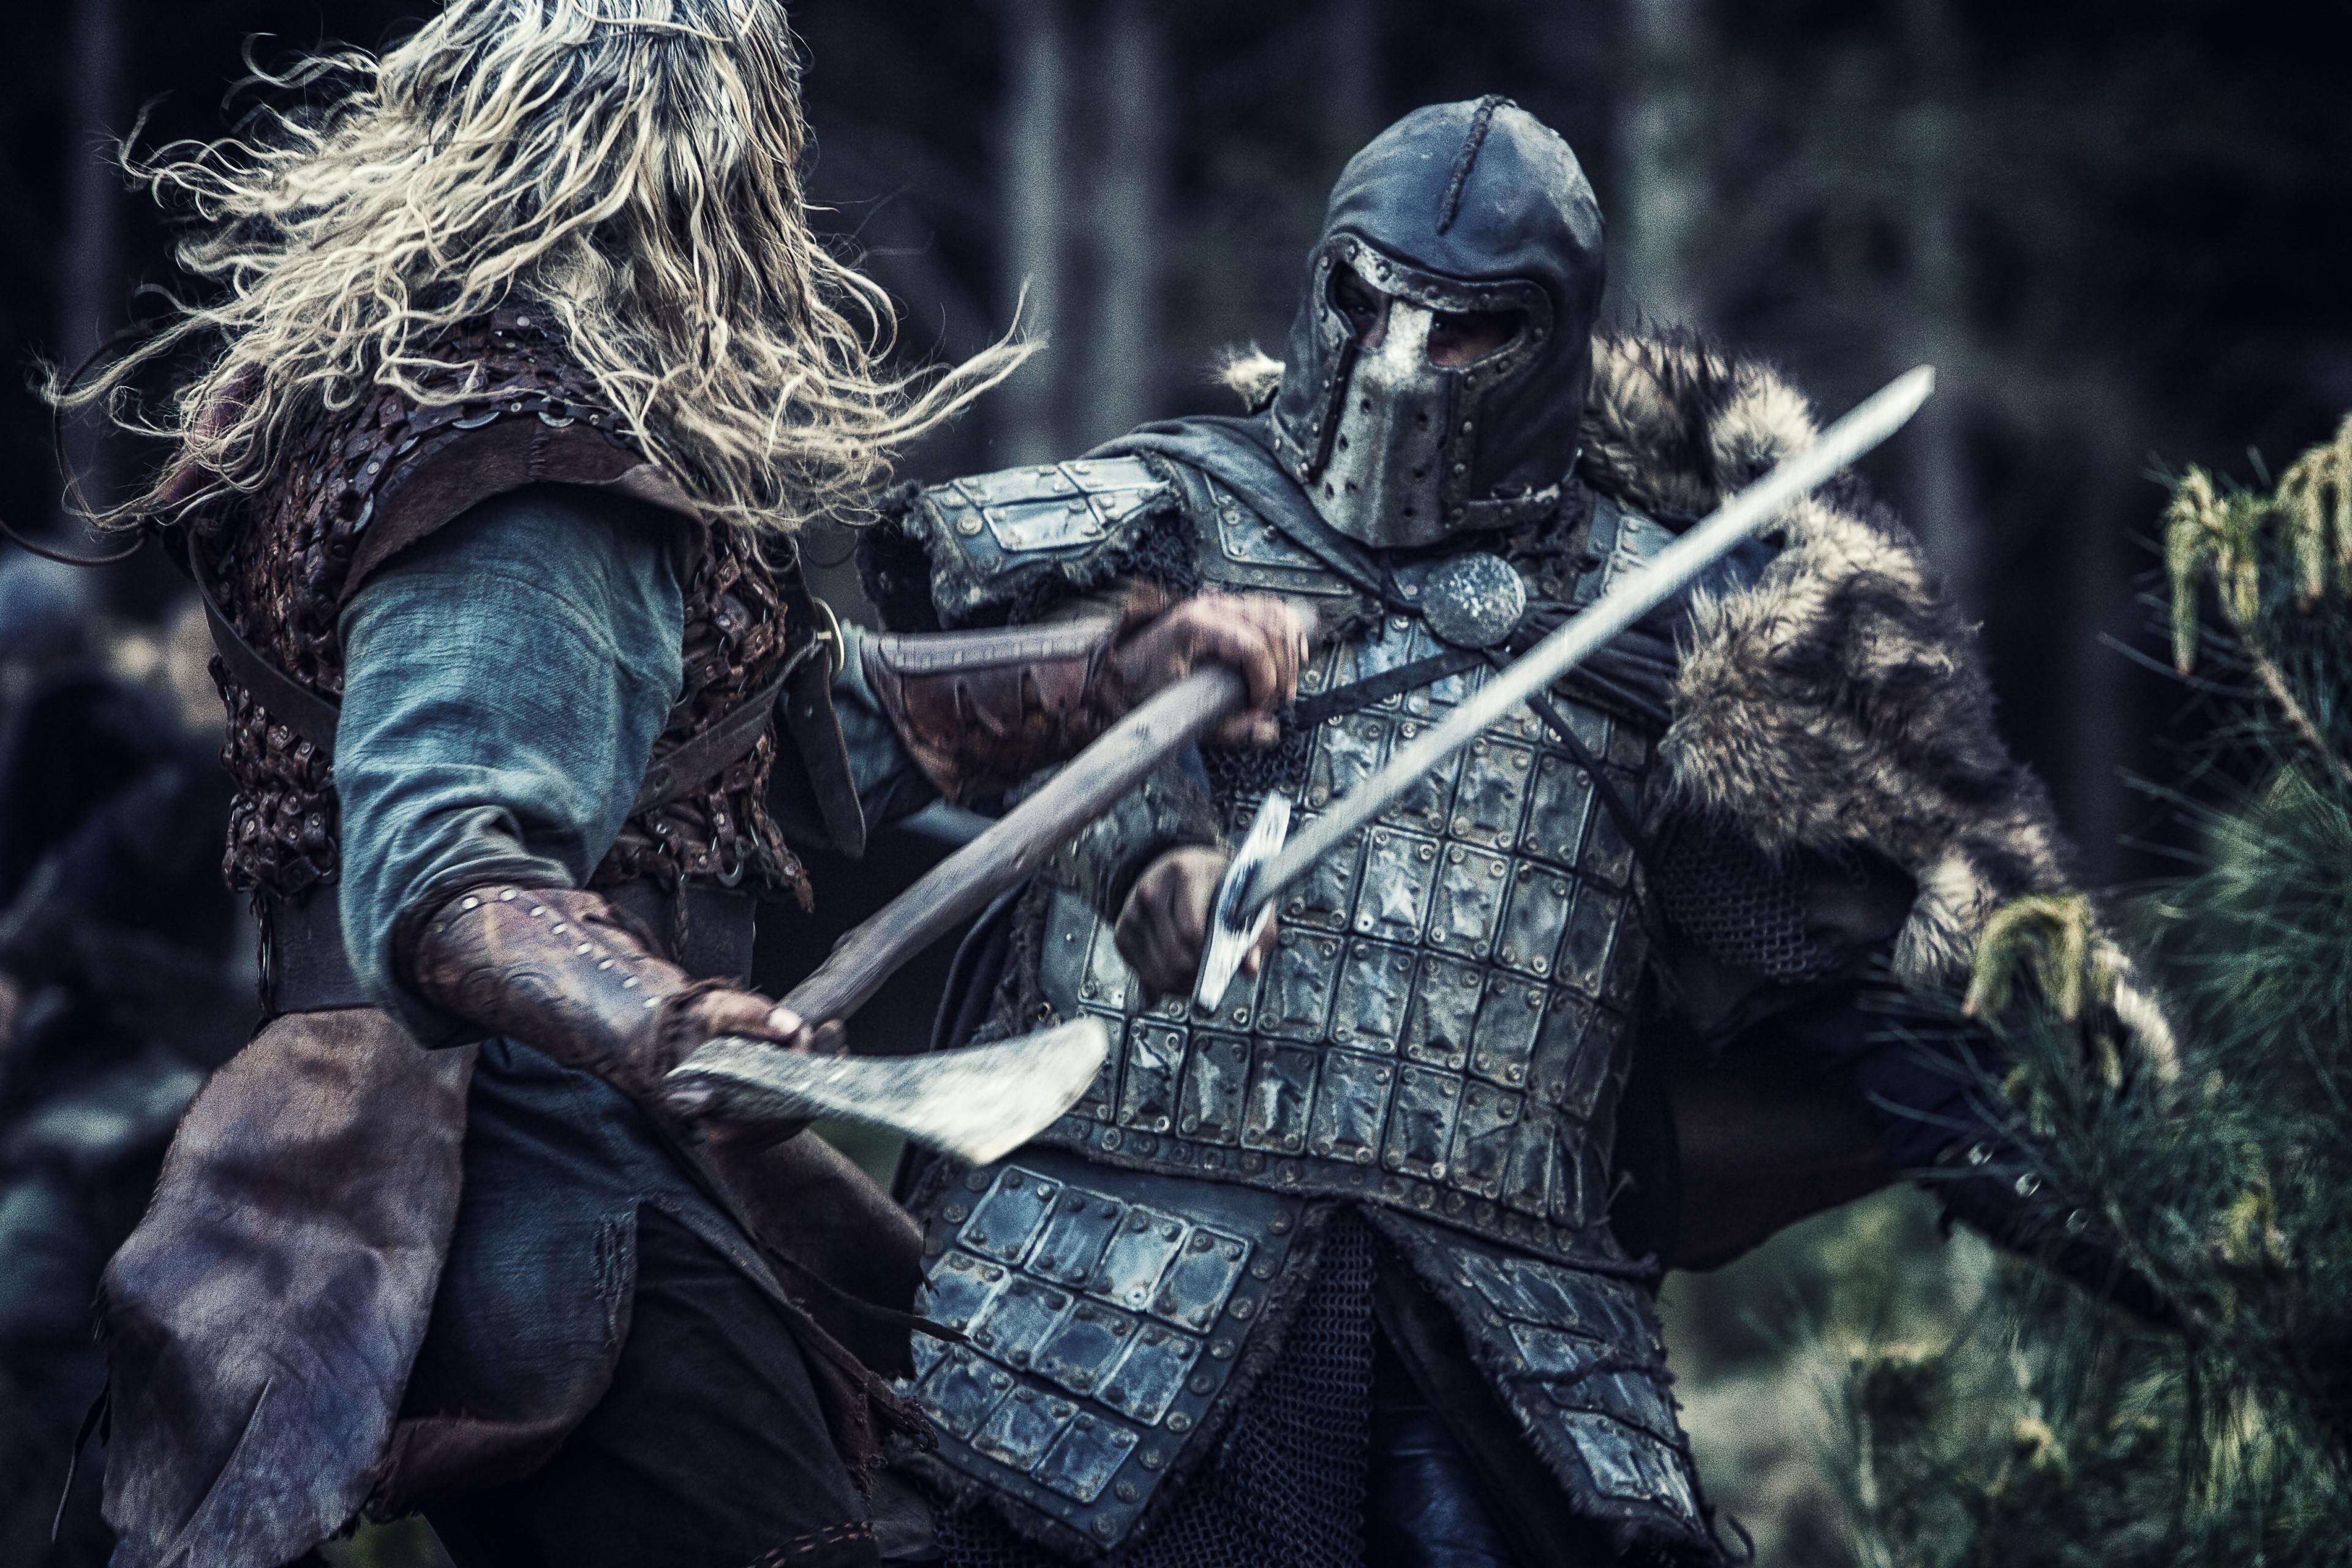 northmen-les-derniers-vikings-photo-55ccbab6cf2f2